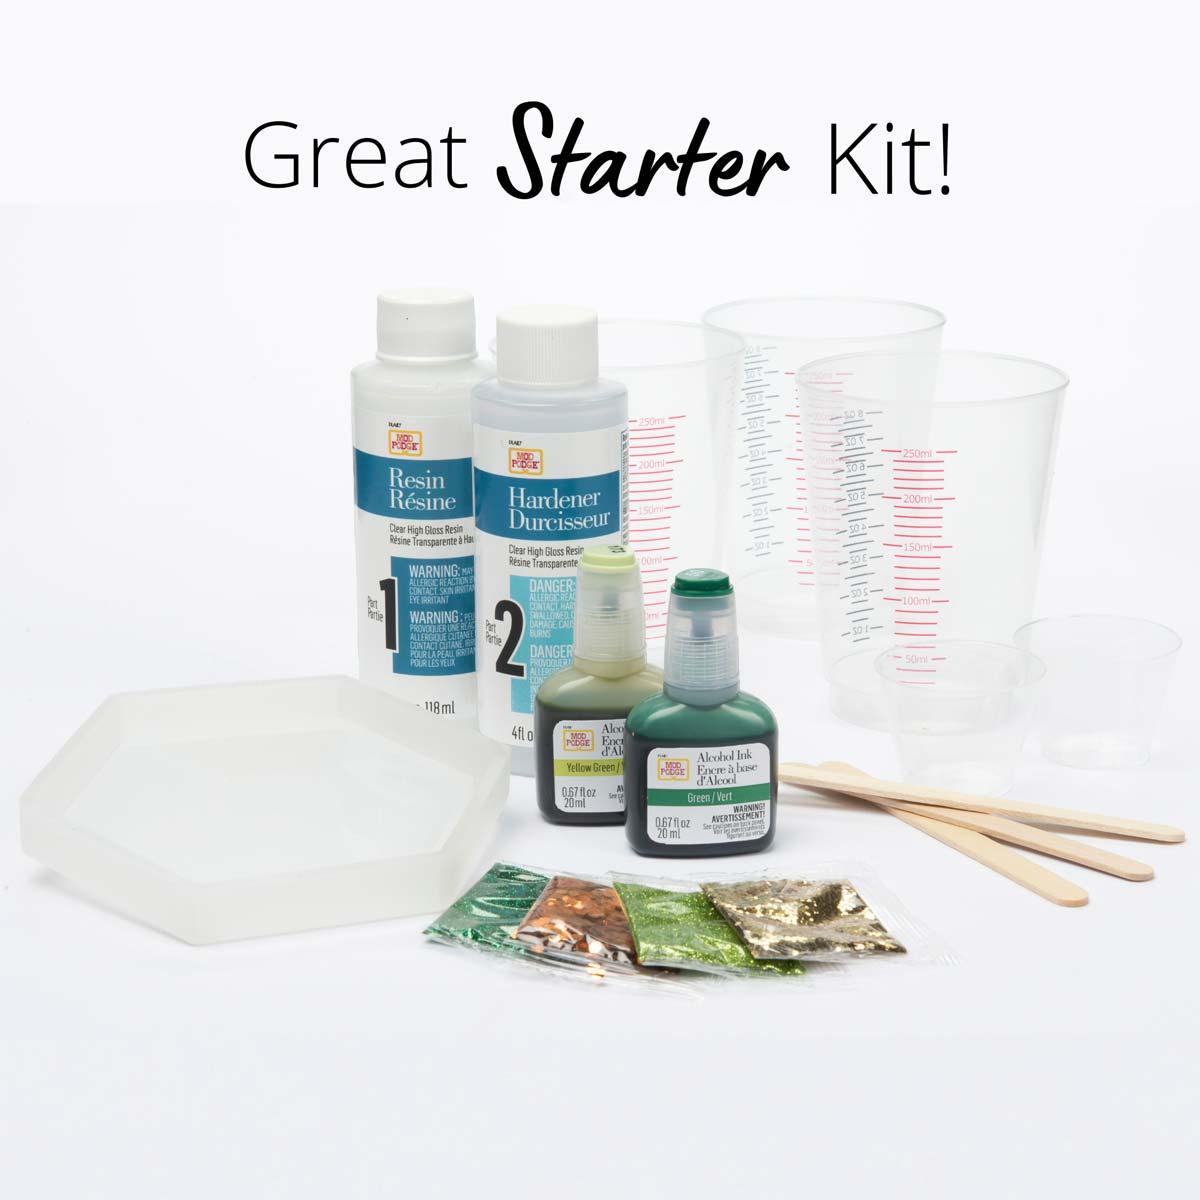 Mod Podge ® Do-It-Yourself Resin Kit - Tropical Leaf - 25298E